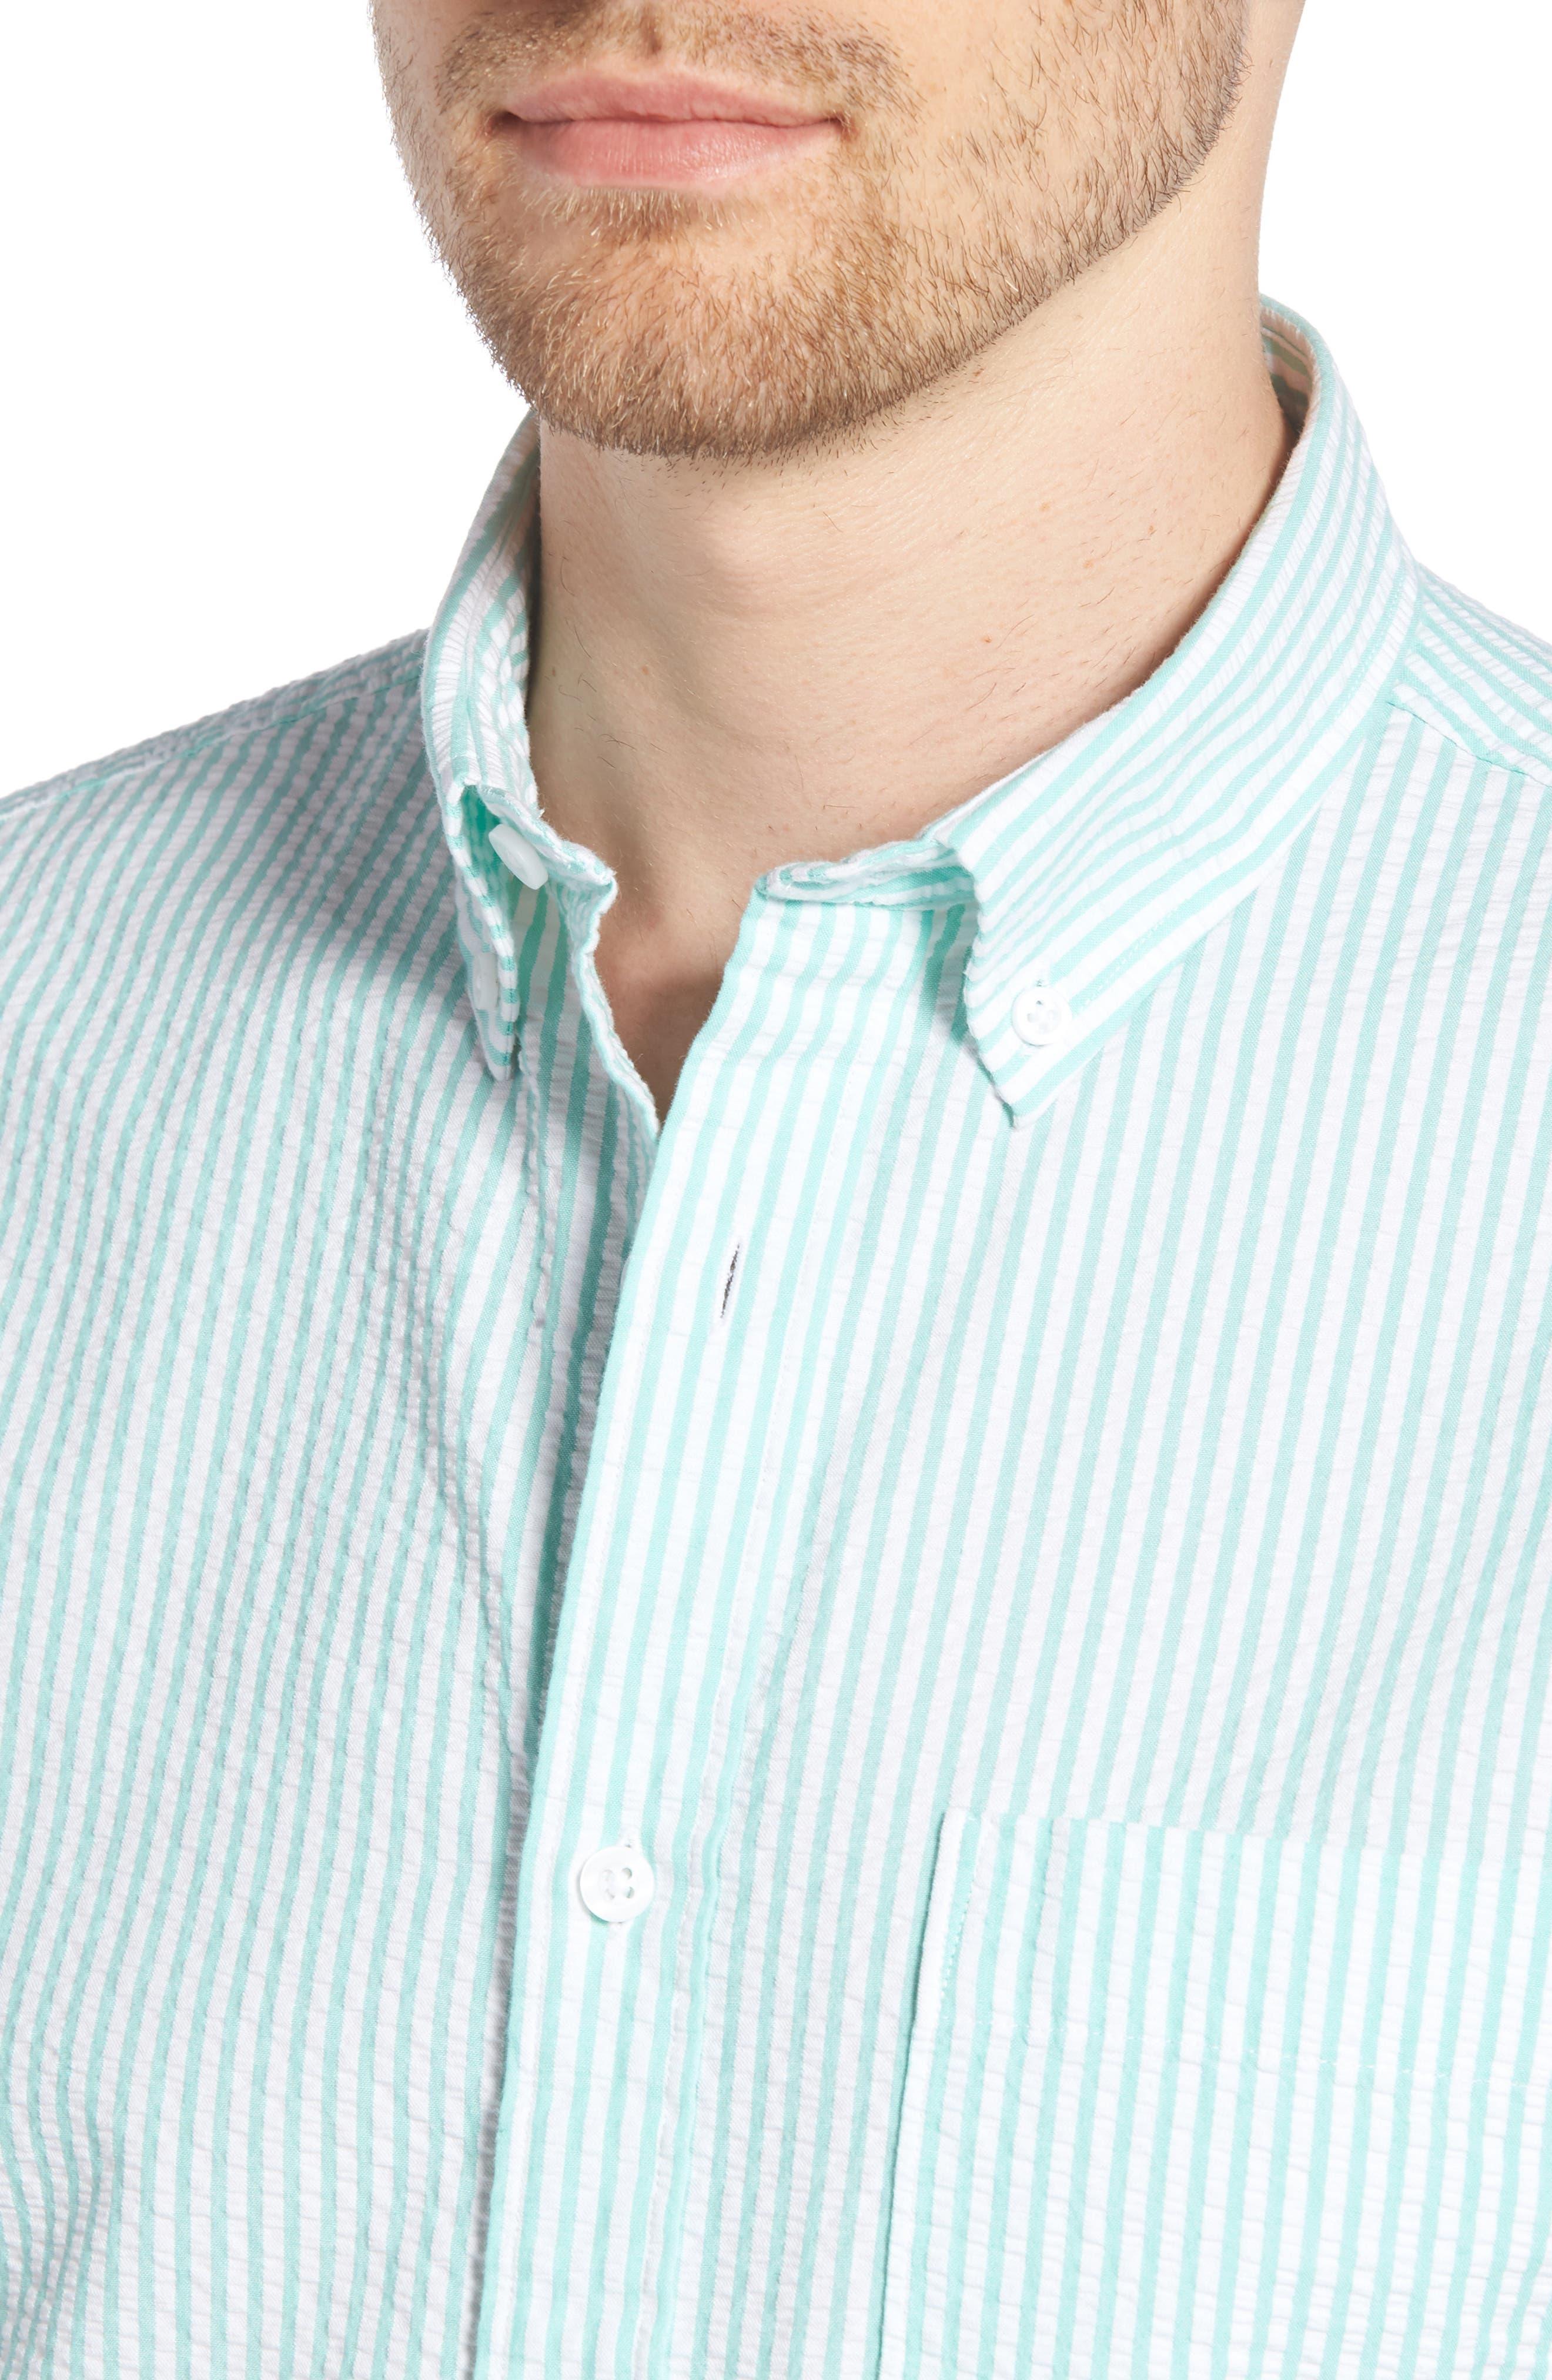 Trim Fit Seersucker Short Sleeve Sport Shirt,                             Alternate thumbnail 2, color,                             White Green Seersucker Stripe